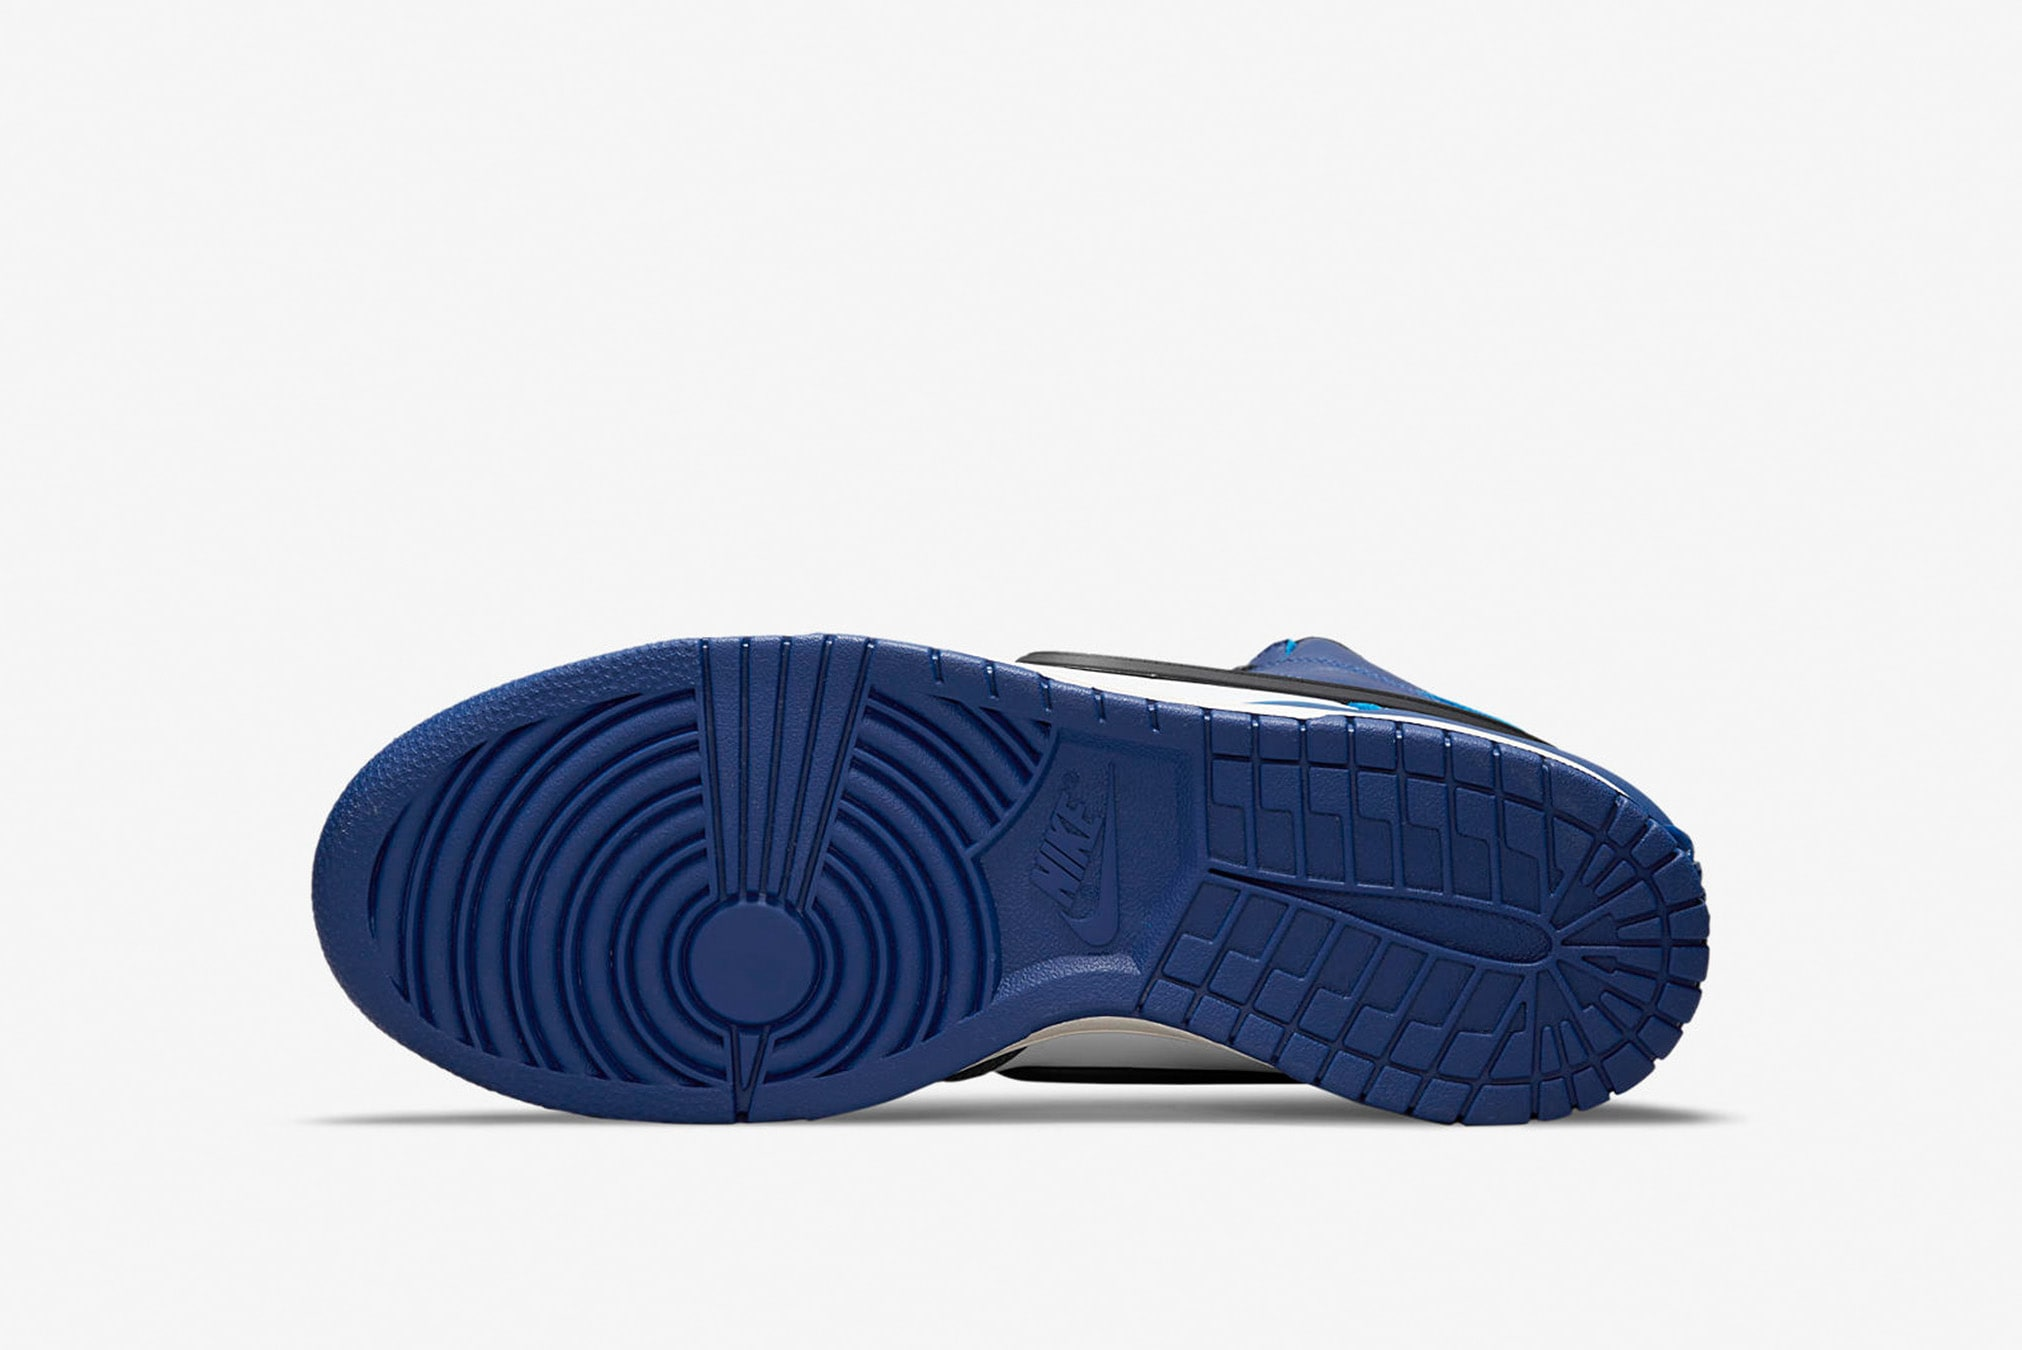 Nike x Ambush Dunk High - CU7544-400